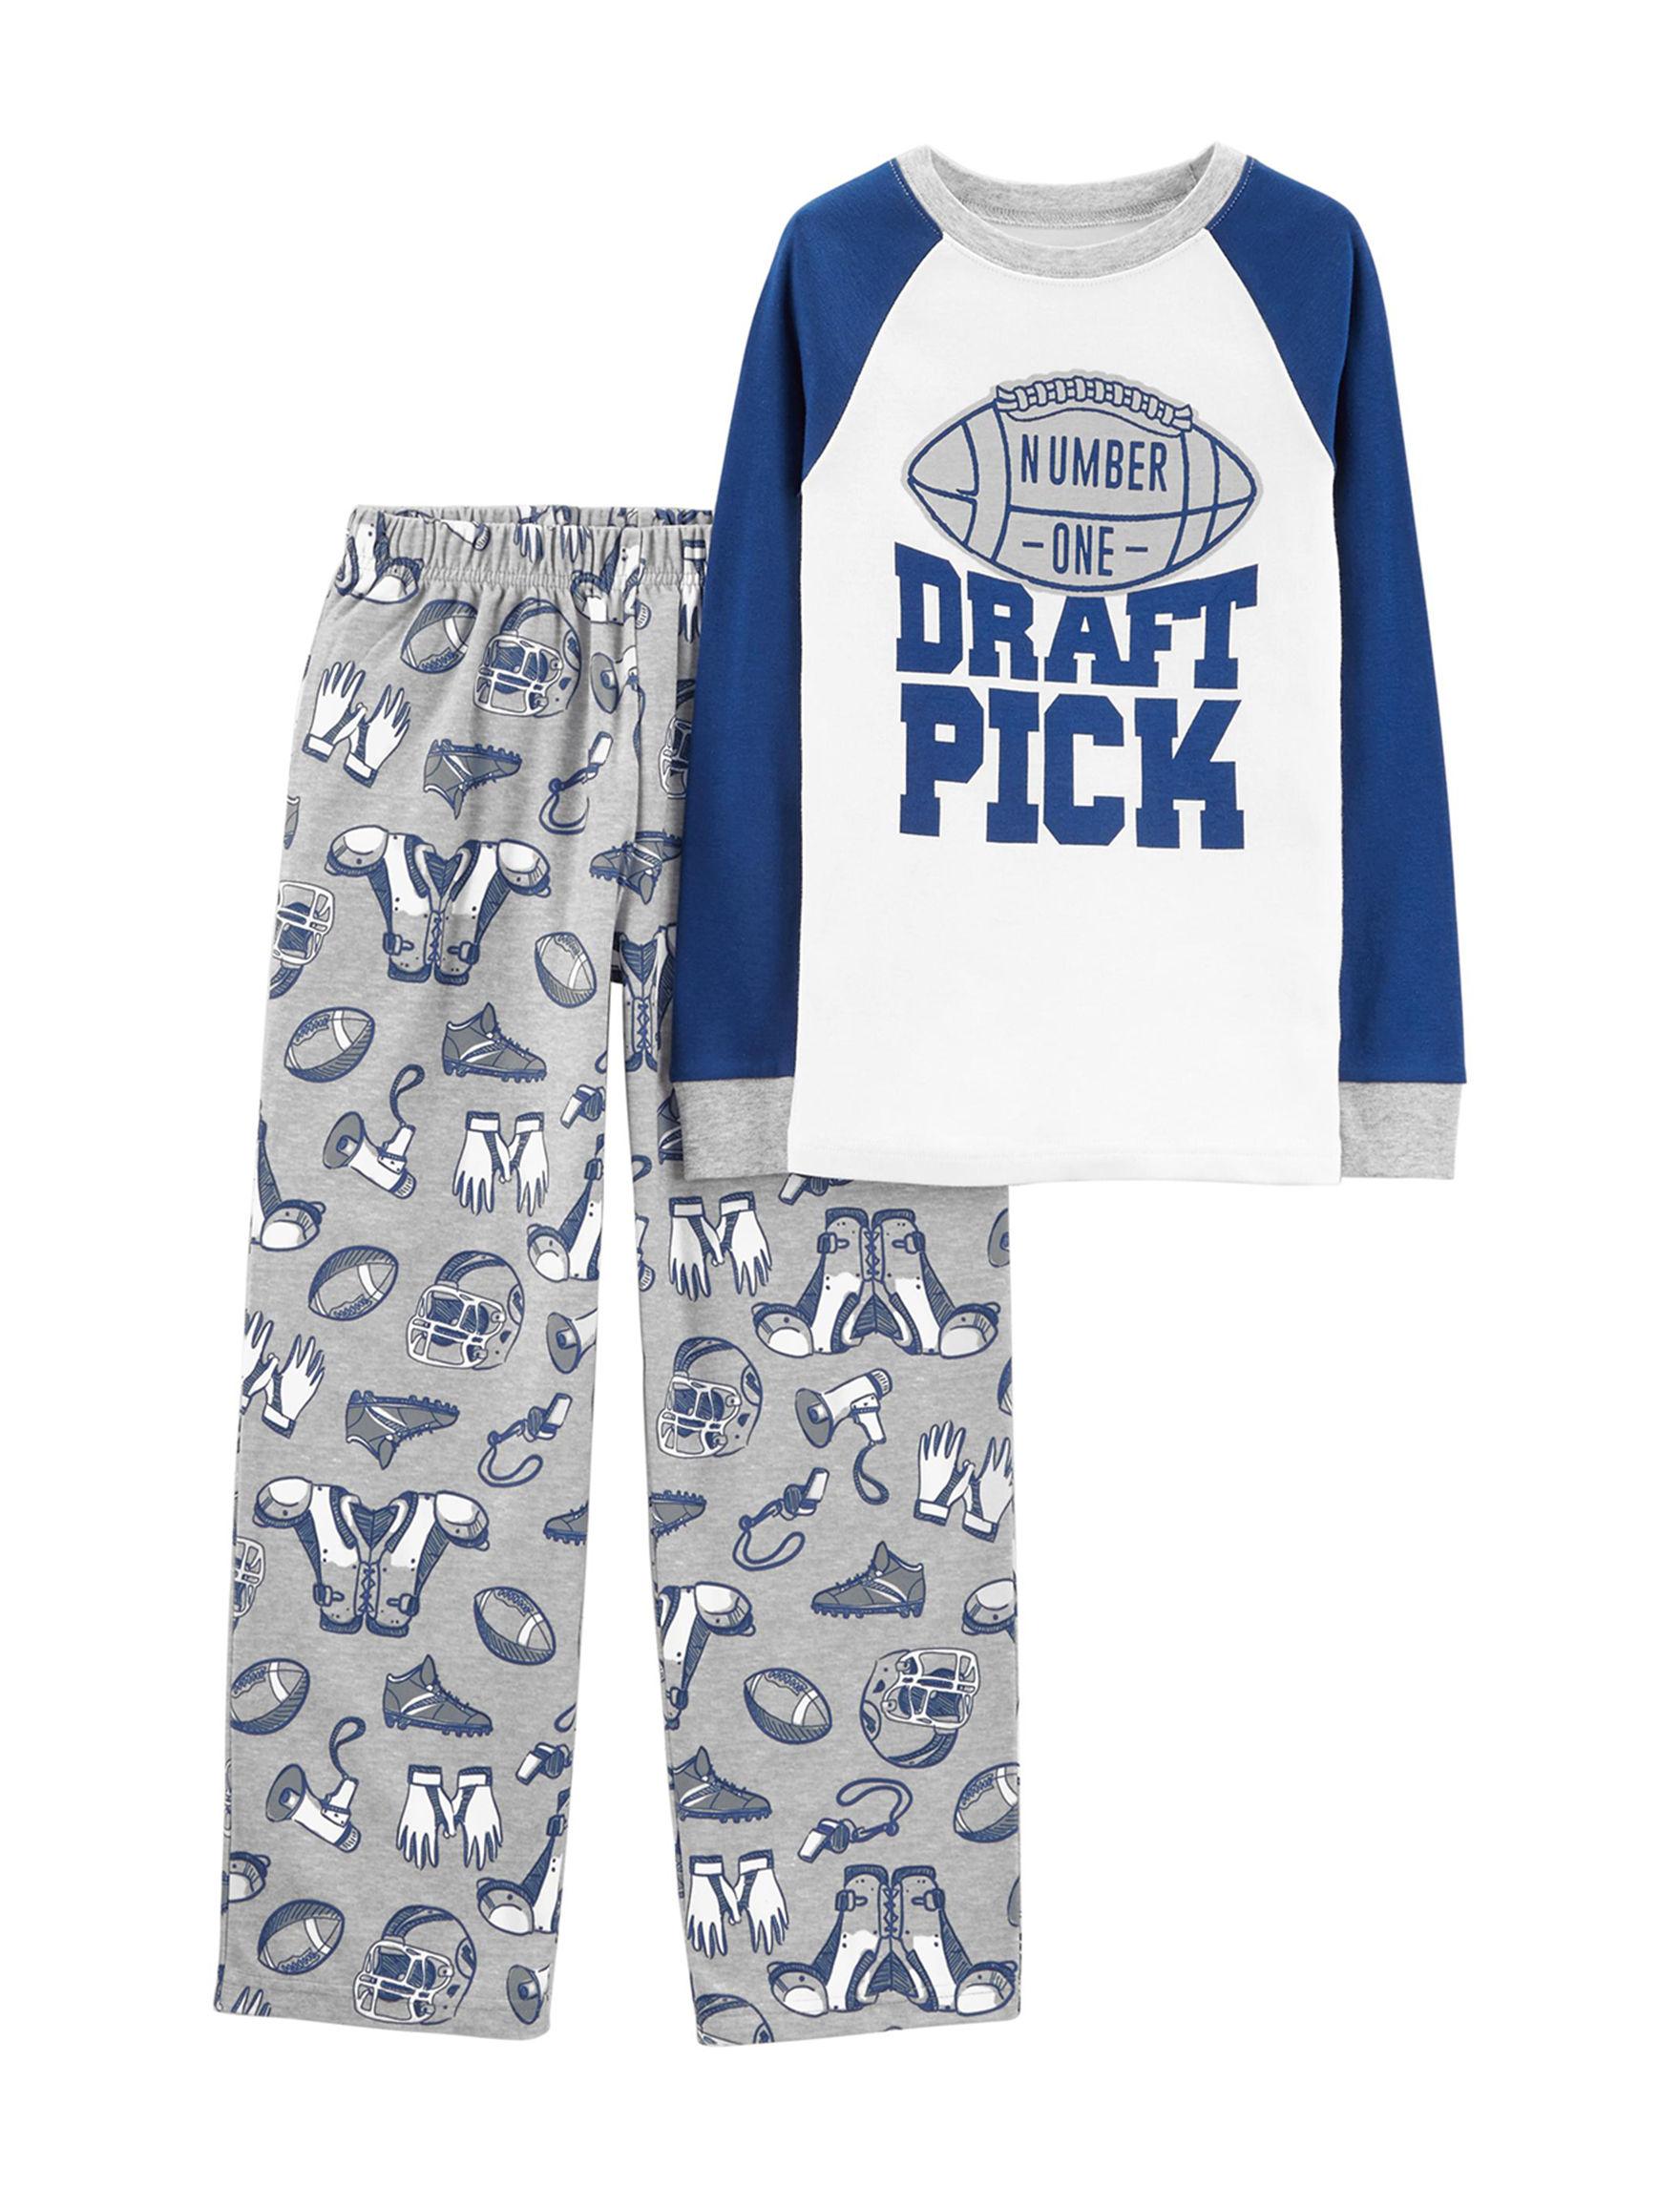 Carter's Grey / Blue Pajama Sets